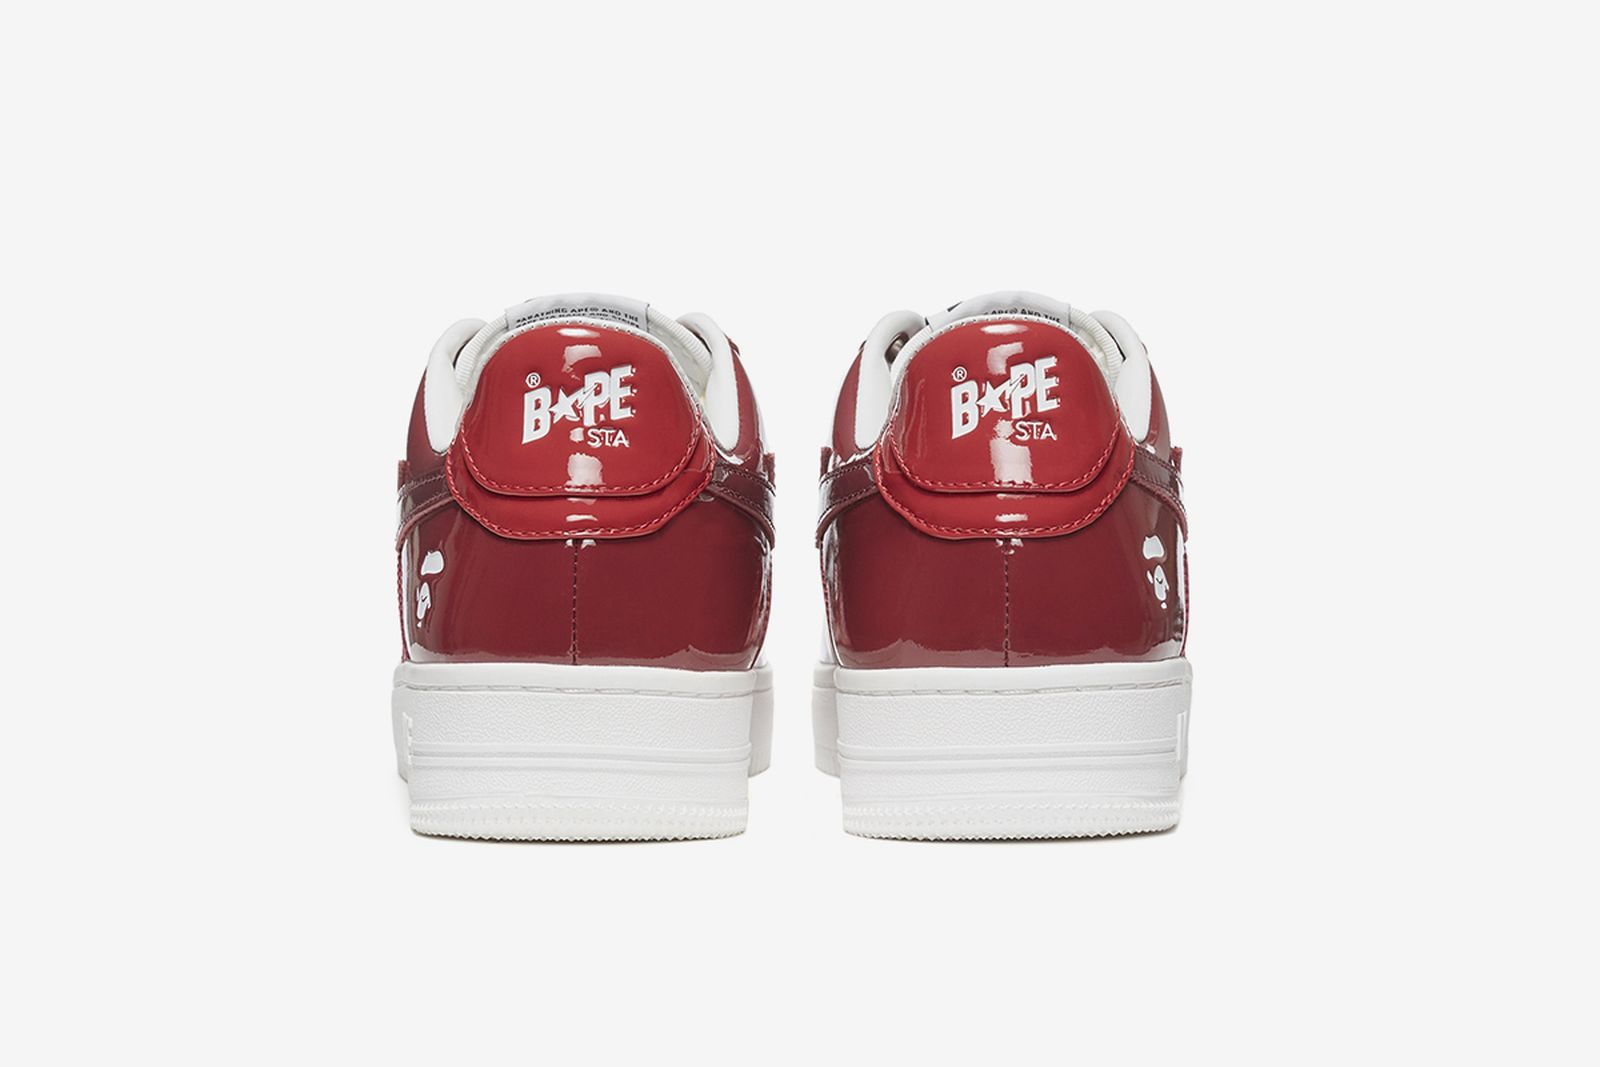 bape-sta-color-camo-combo-release-date-price-17